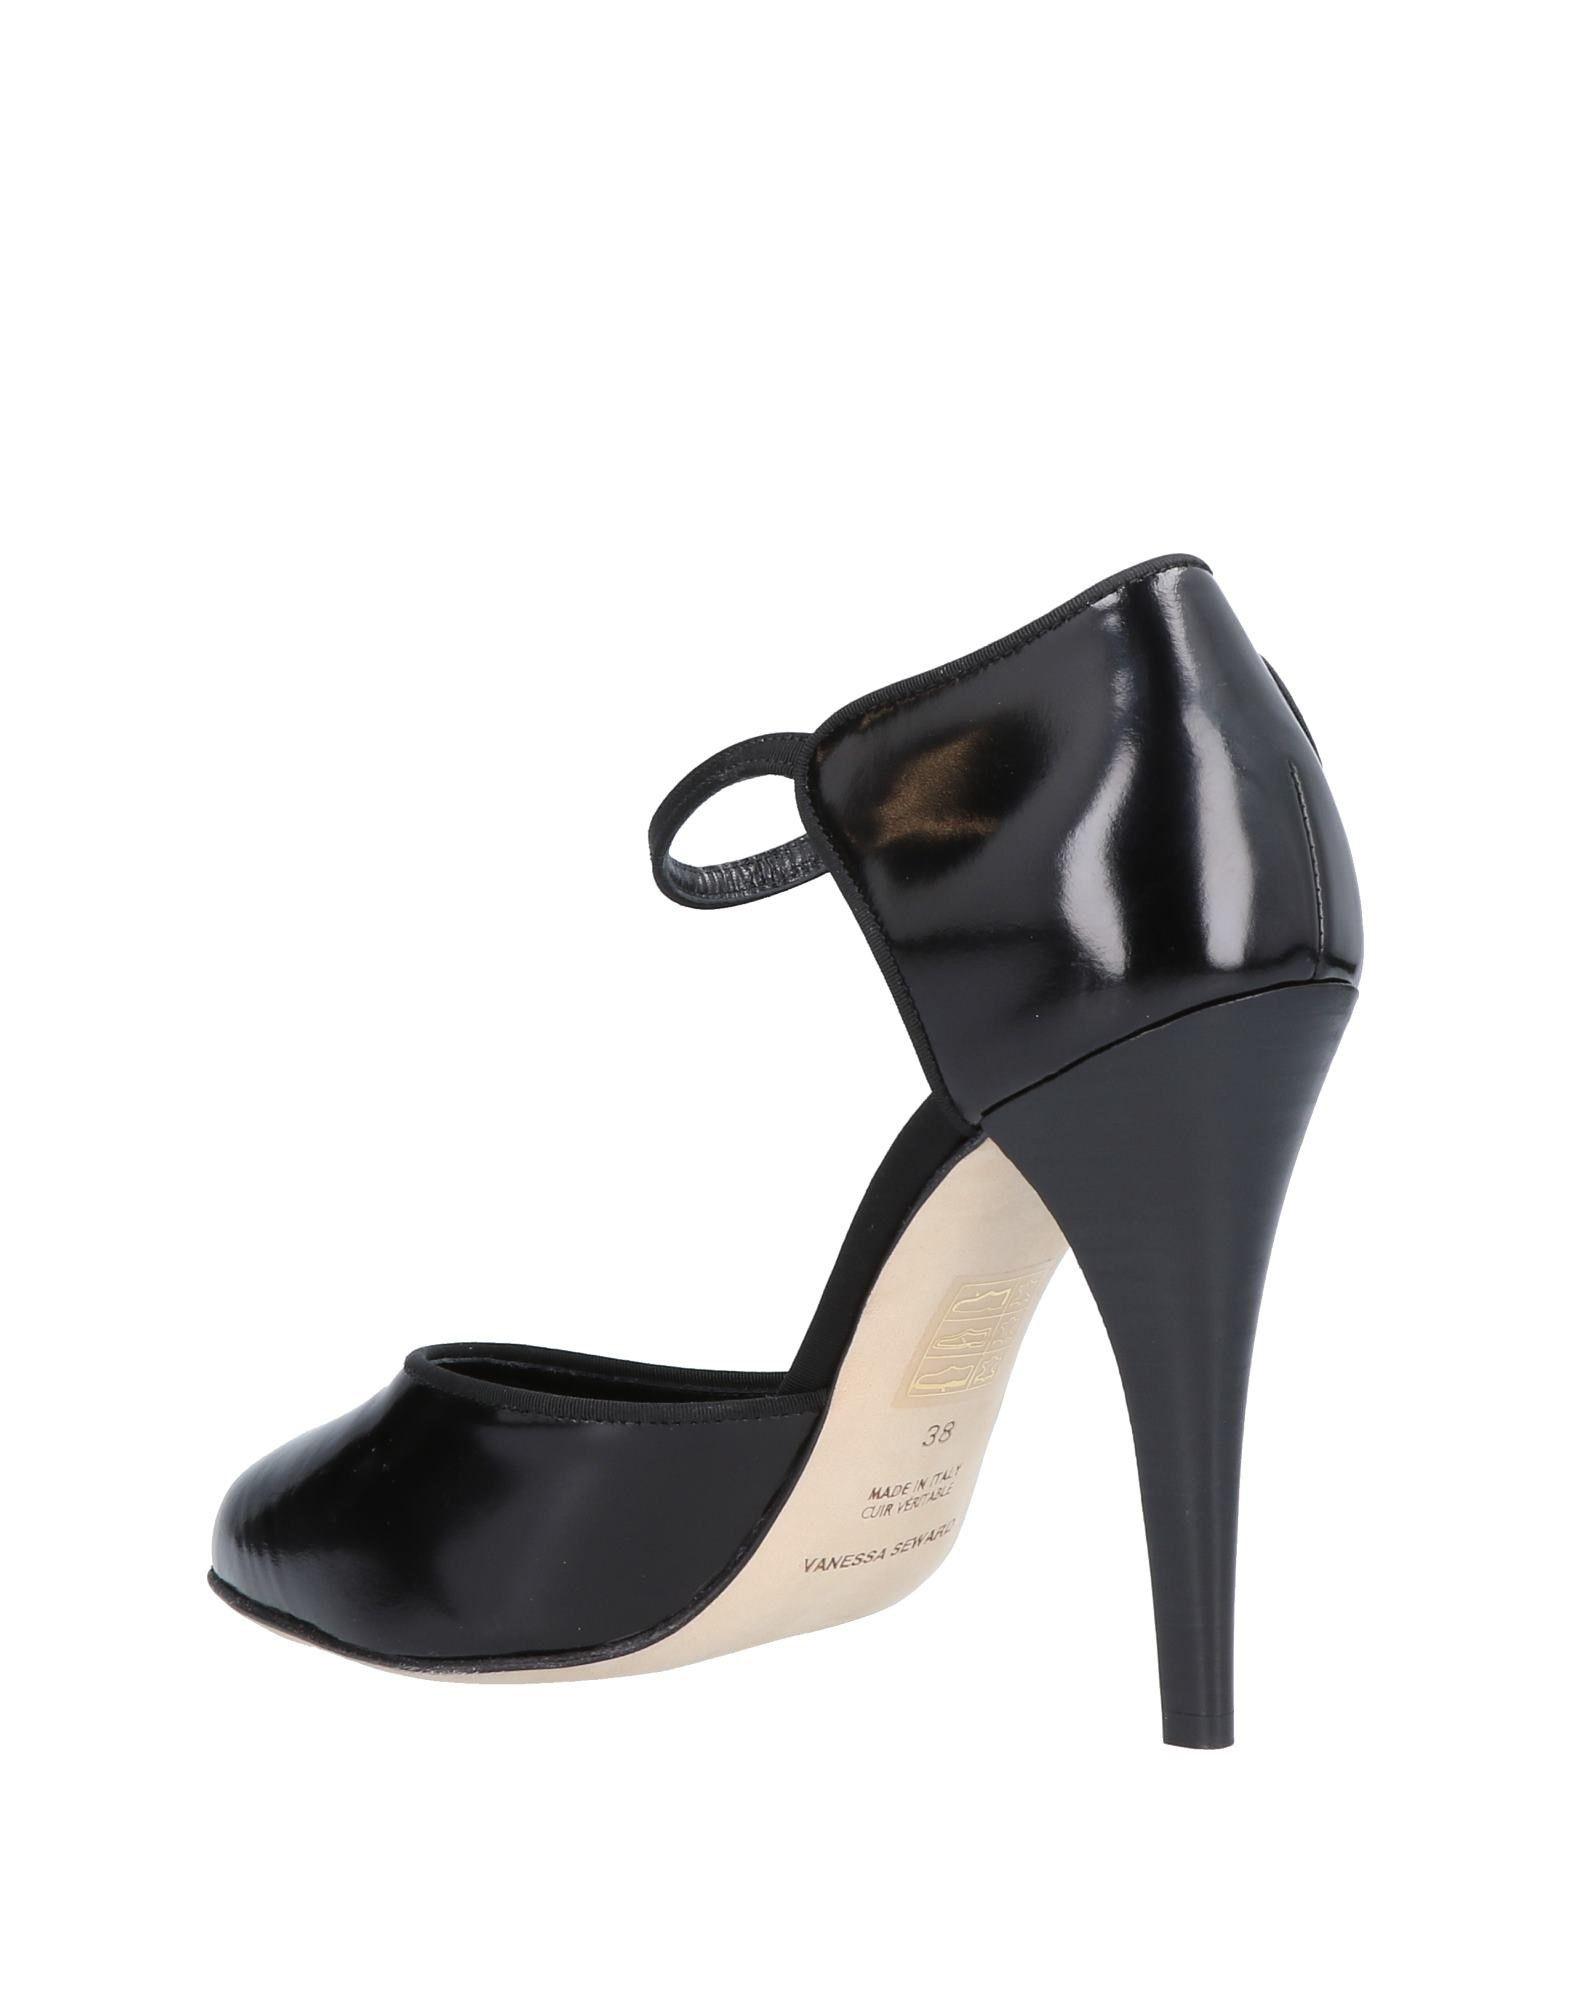 Stilvolle billige Pumps Schuhe Vanessa Seward Pumps billige Damen  11476082TR 683b7b